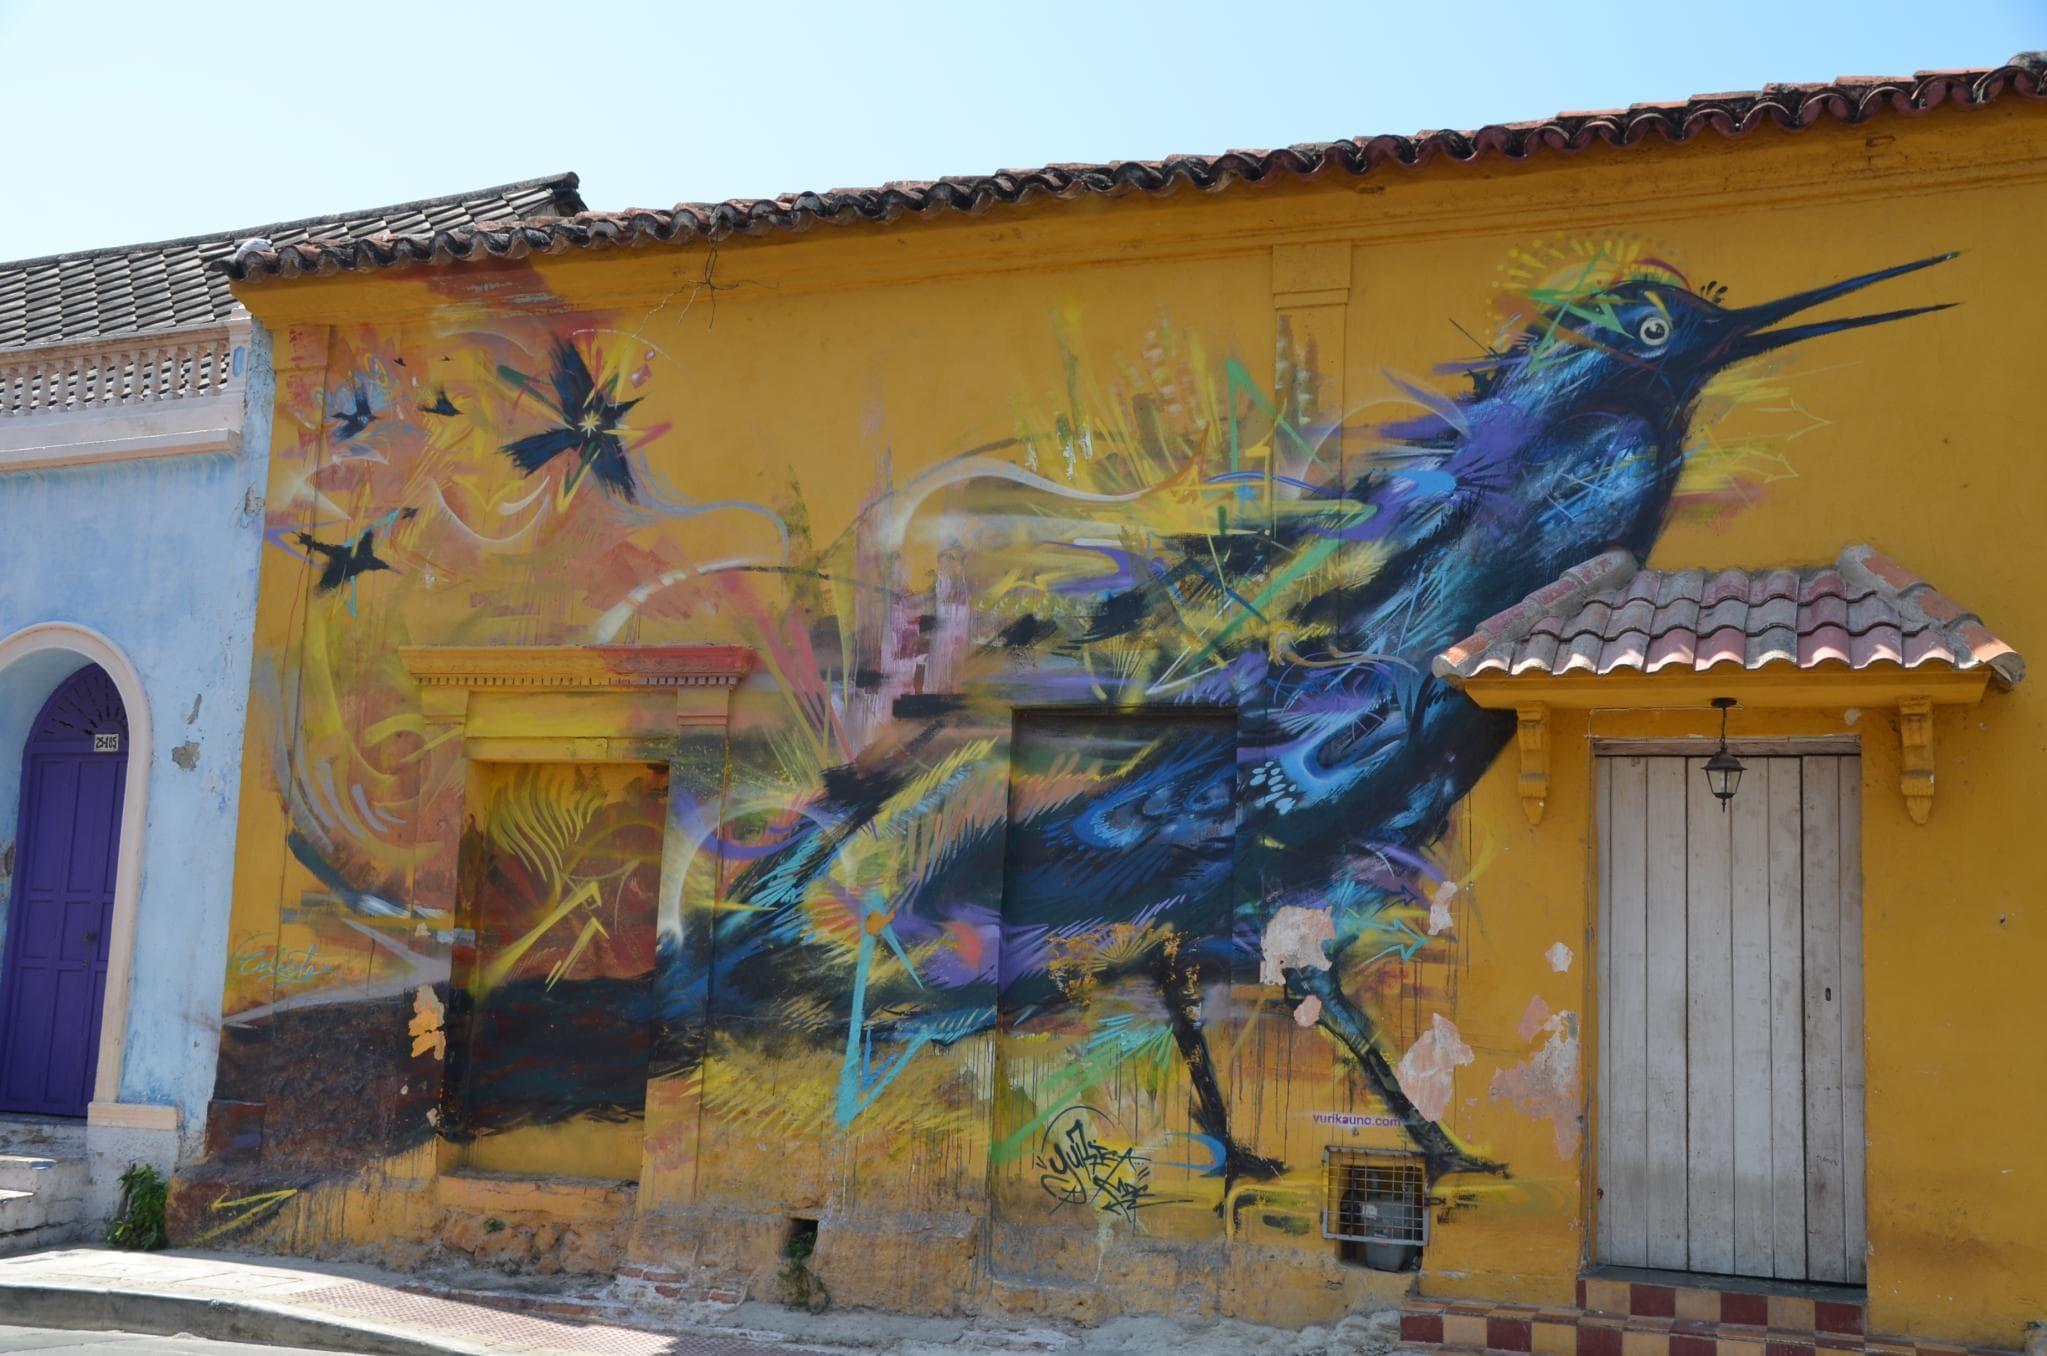 A tropical bird in Getsemani, Cartagena Colombia